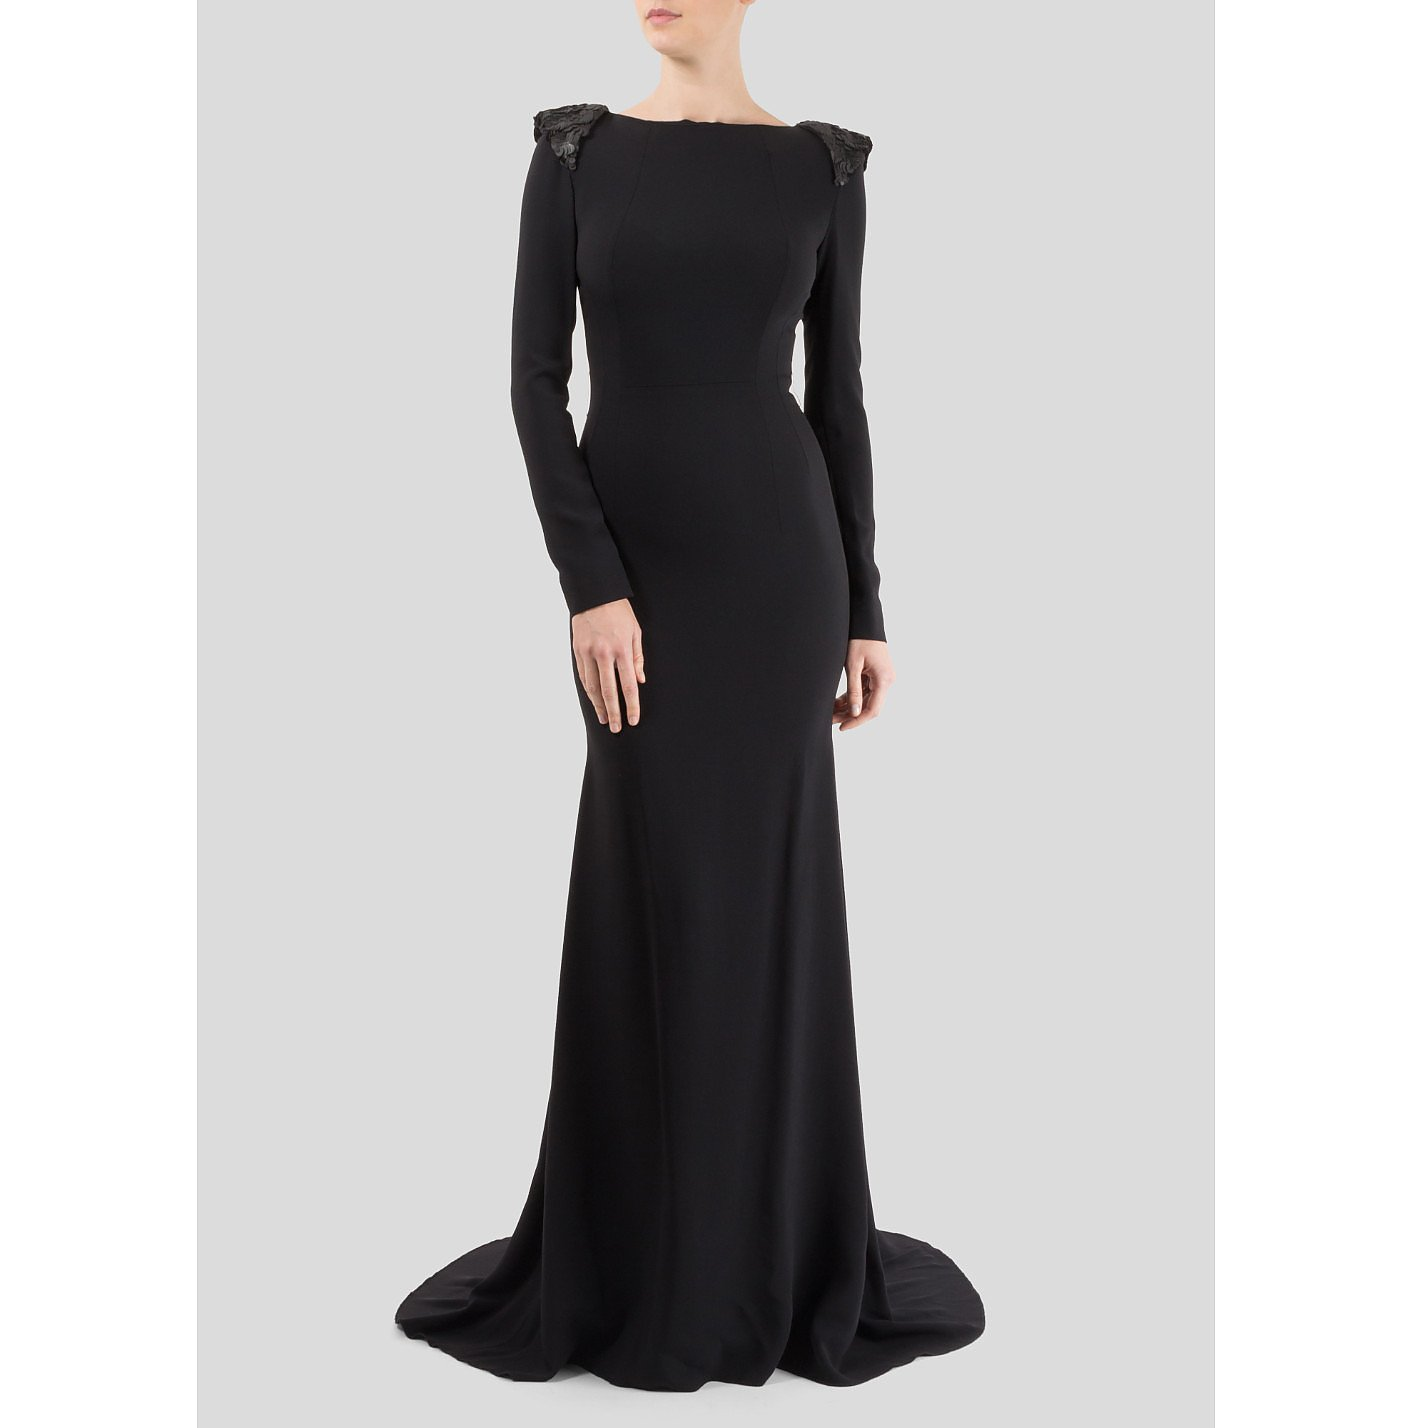 Victoria Beckham Perrault Gown